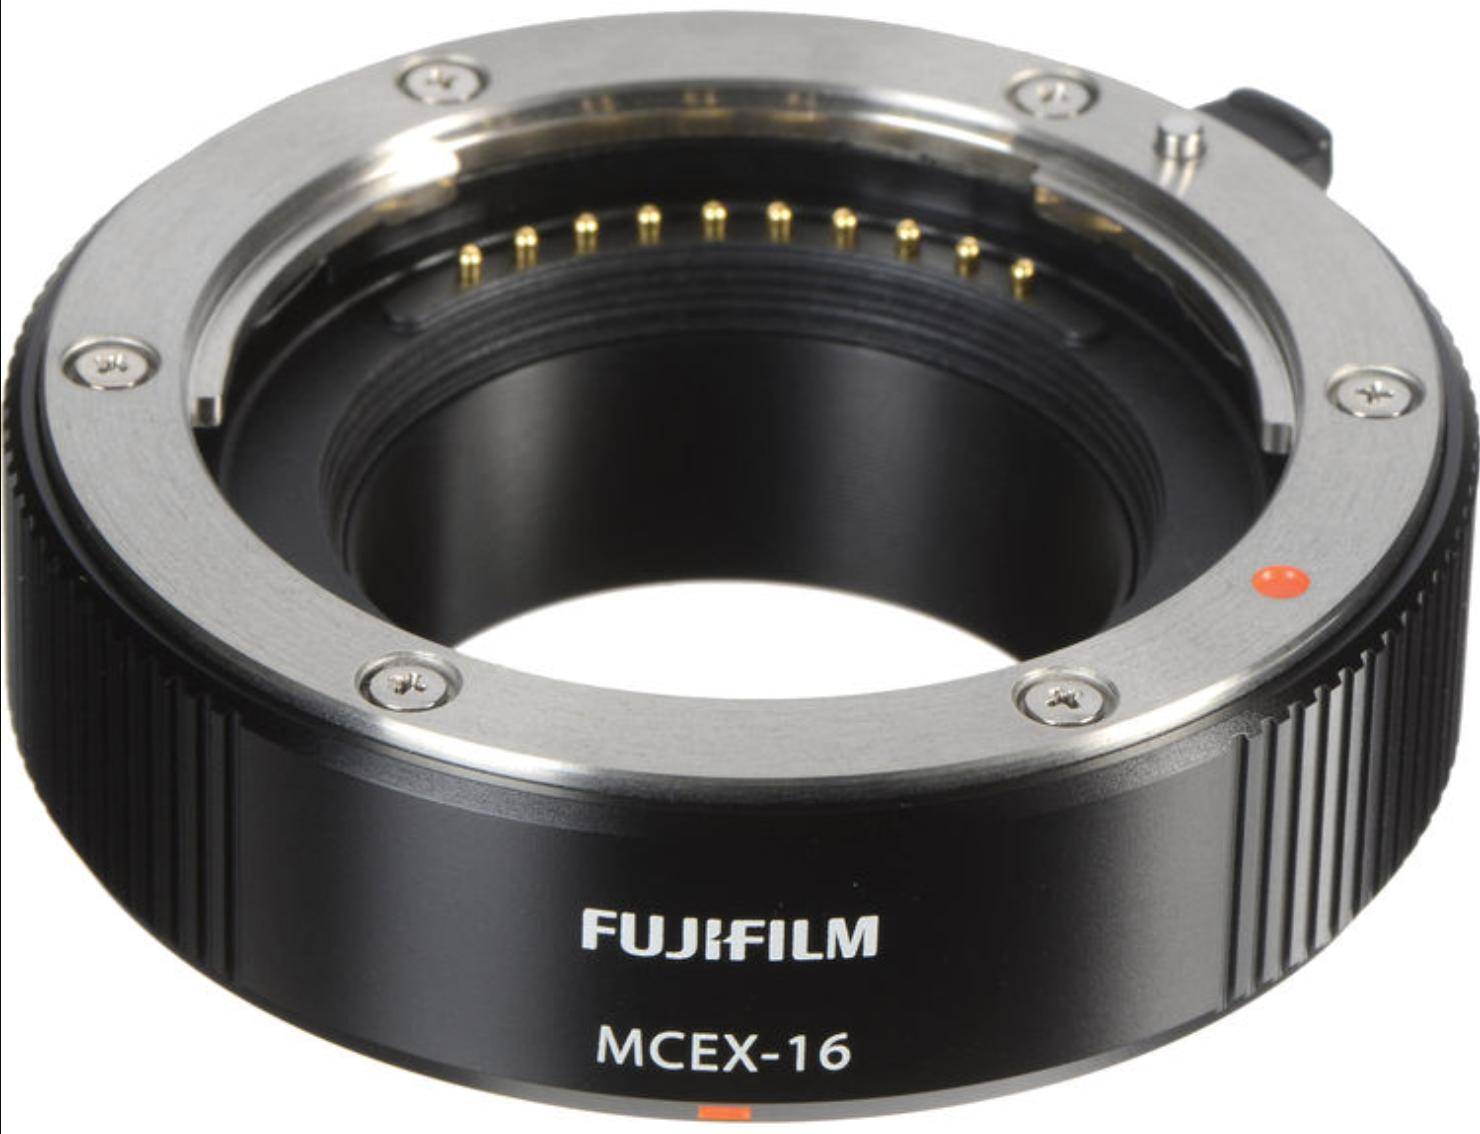 Fujifilm MCEX-16 16mm Extension Tube